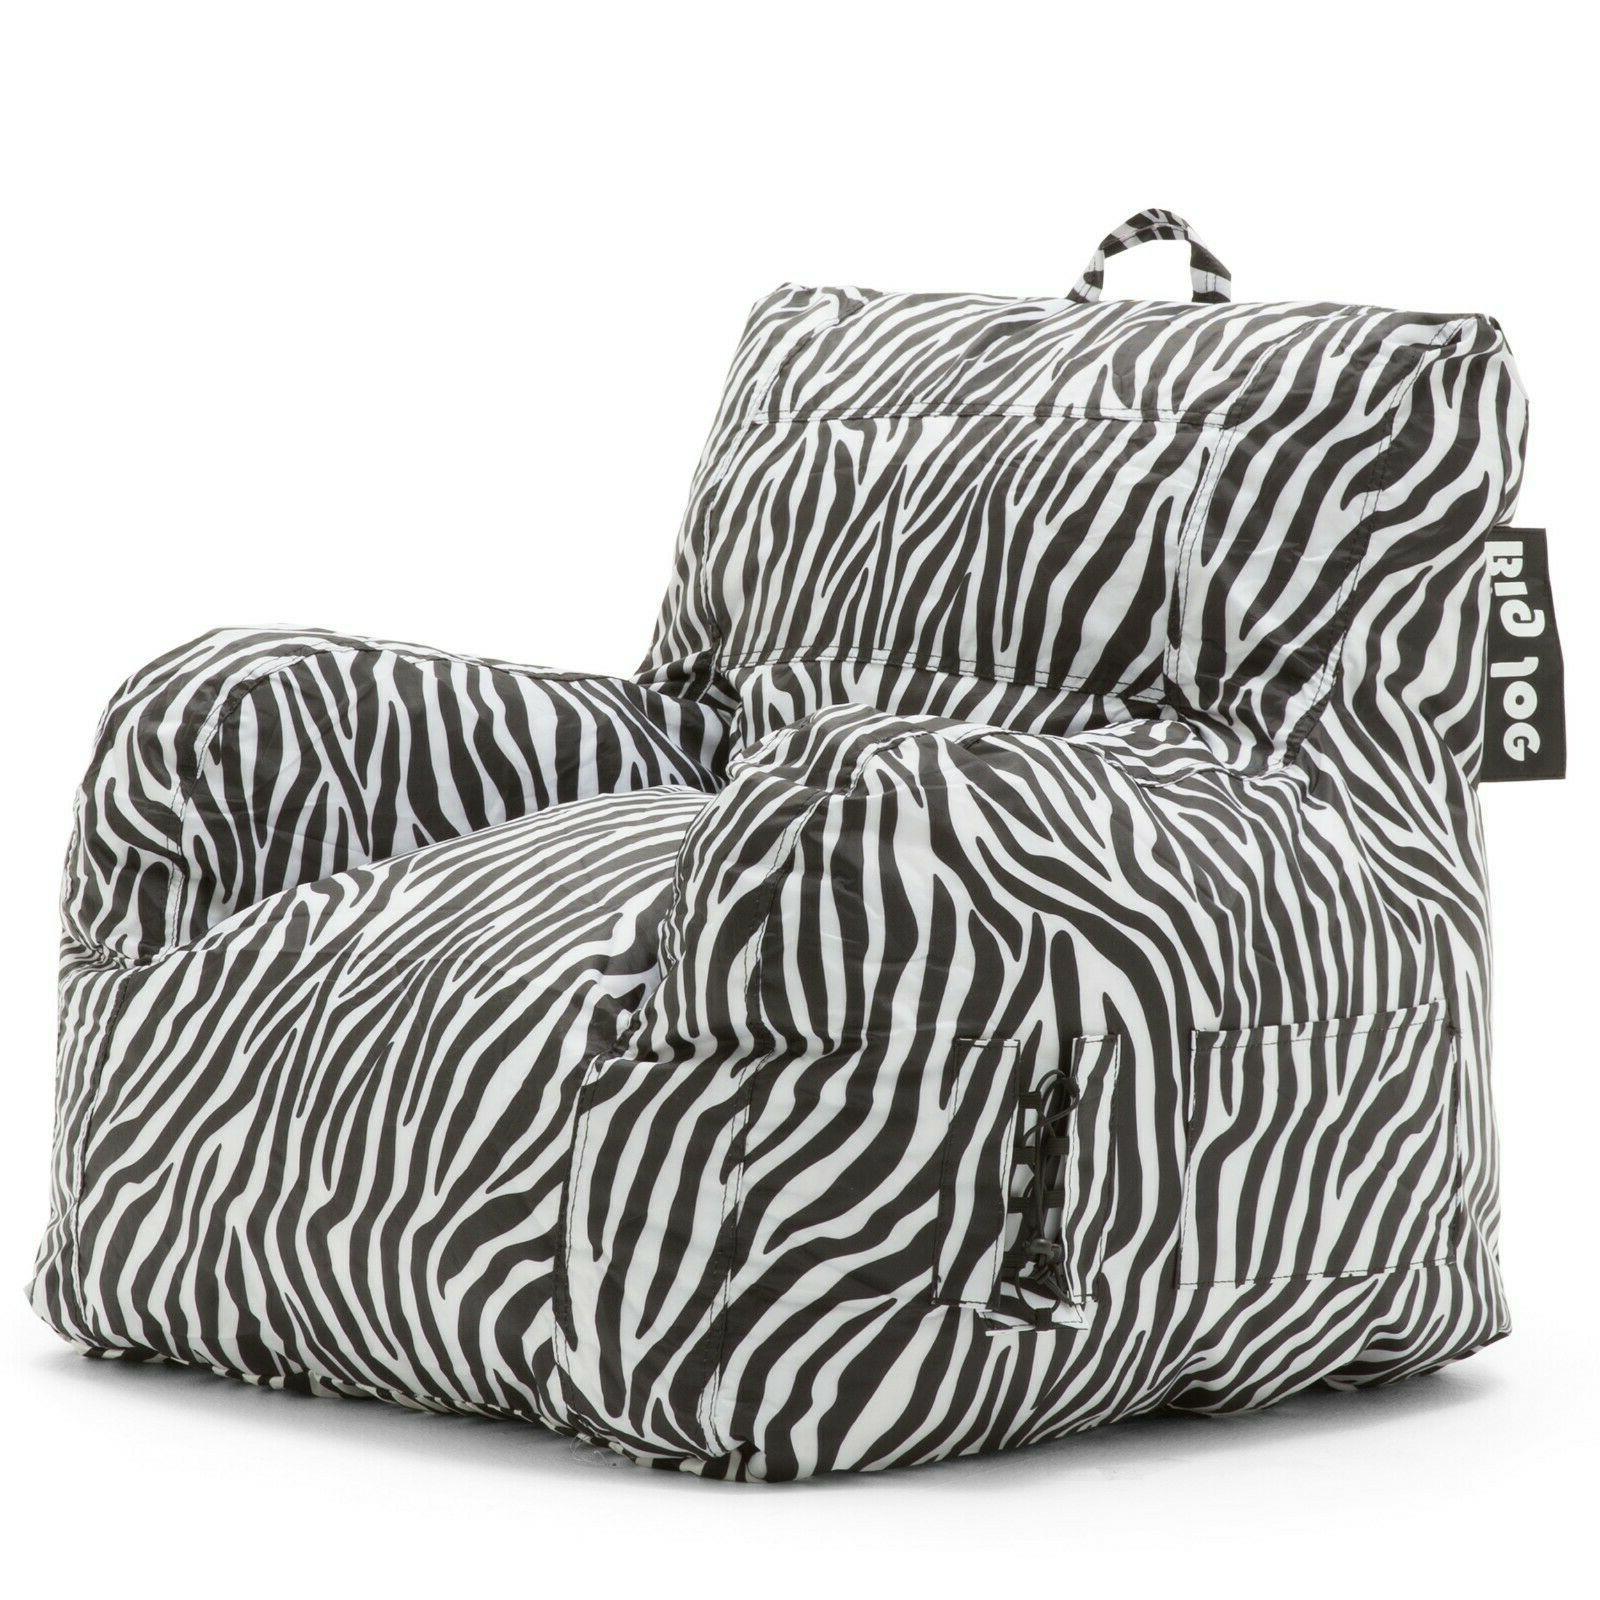 XL Big Joe Milano Bean Bag Cup Multiple Colors Comfort For Kids